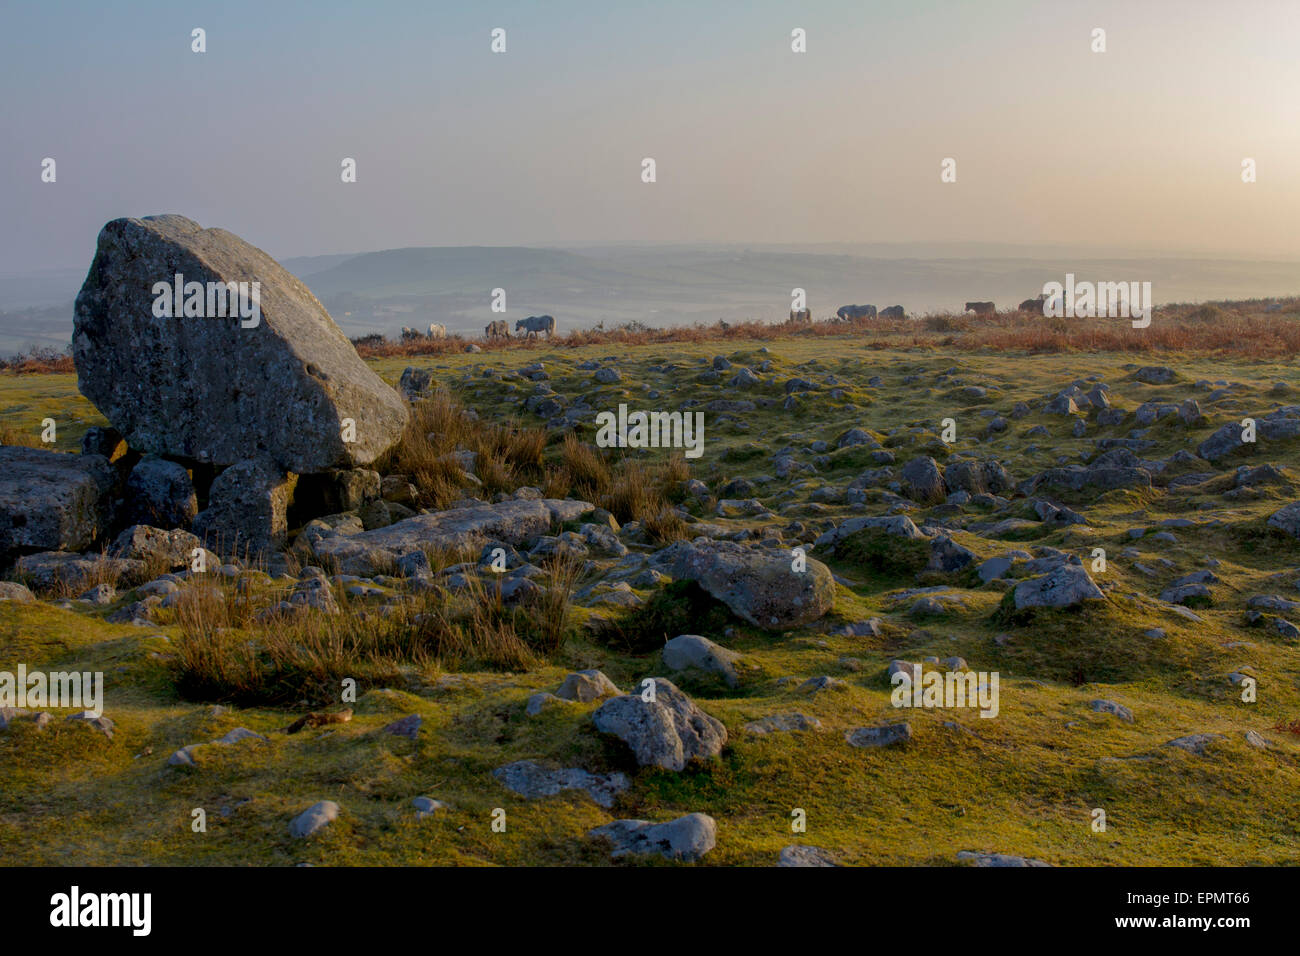 Arthur's Stone (Maen Ceti), a Neolithic burial chamber, Gower Peninsula, Swansea, Glamorgan, Wales, United Kingdom - Stock Image